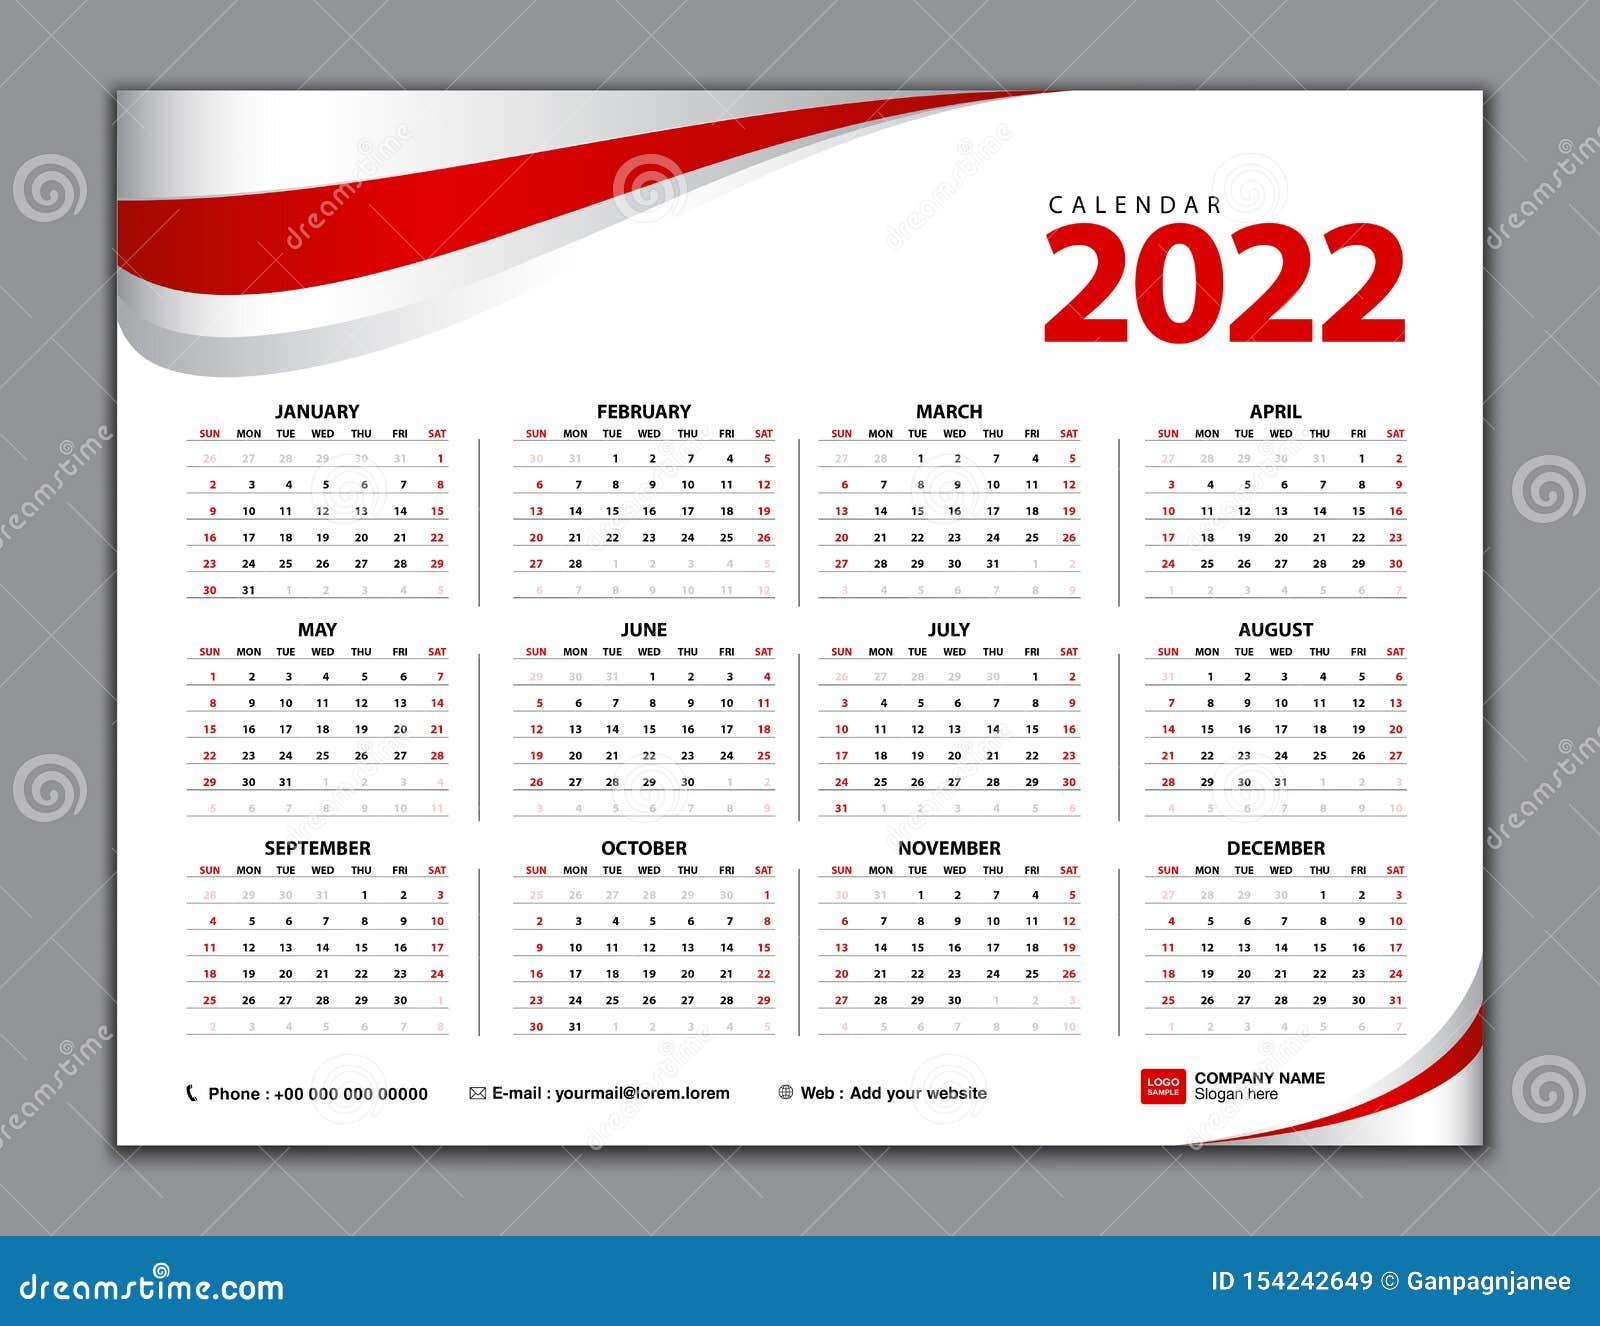 Calendar 2022 Simple Calendar Desk Week Starts From Sunday Set Of 12 Months Vector Template Stock Vector Illustration Of Office Organizer 154242649